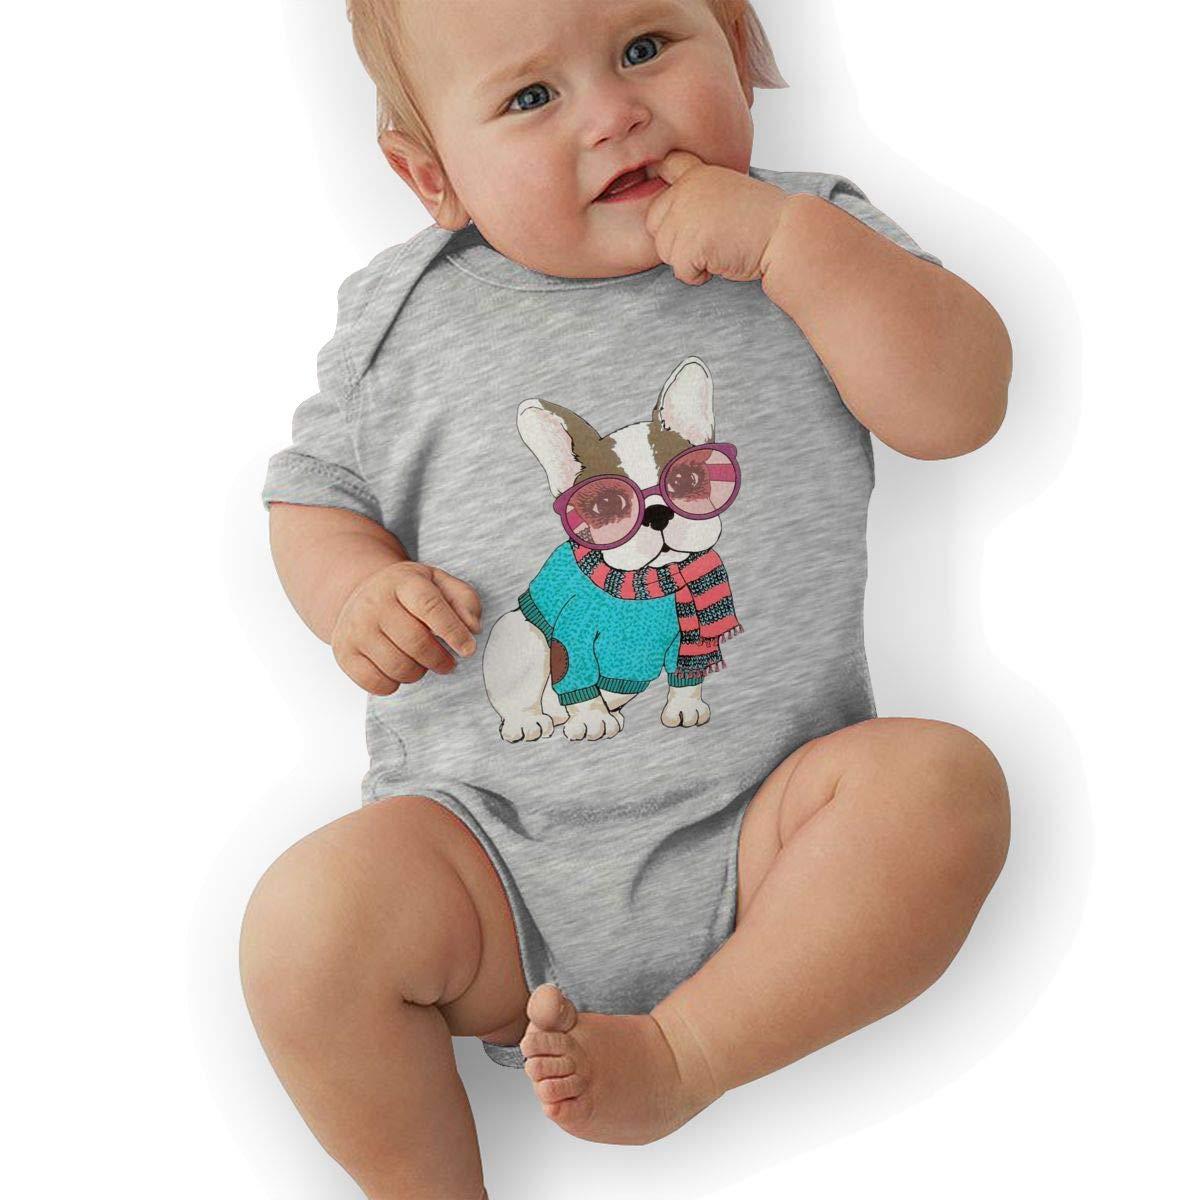 HappyLifea Cute Fashion Dog Newborn Baby Short Sleeve Romper Infant Summer Clothing